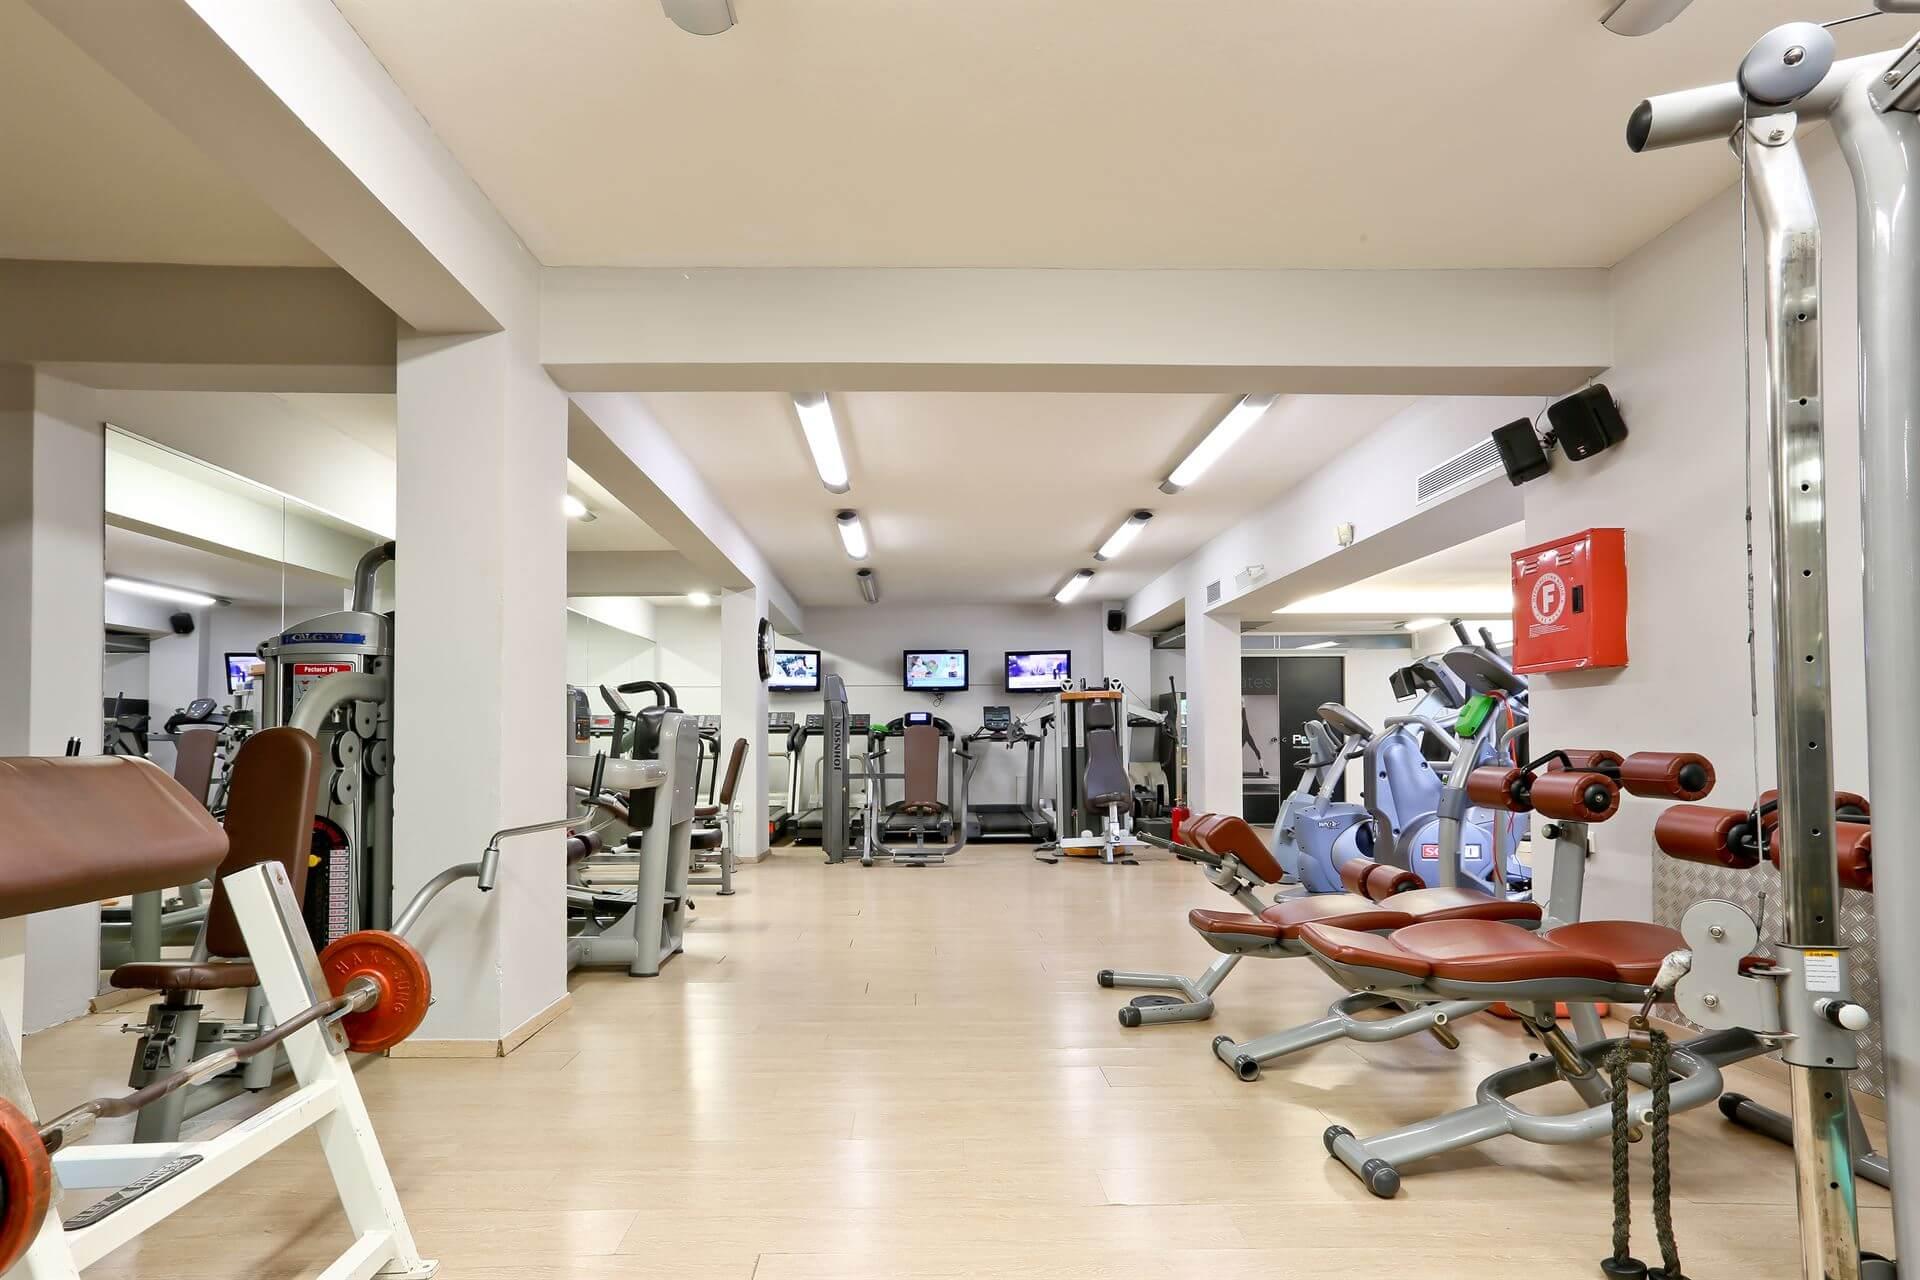 polis gym background